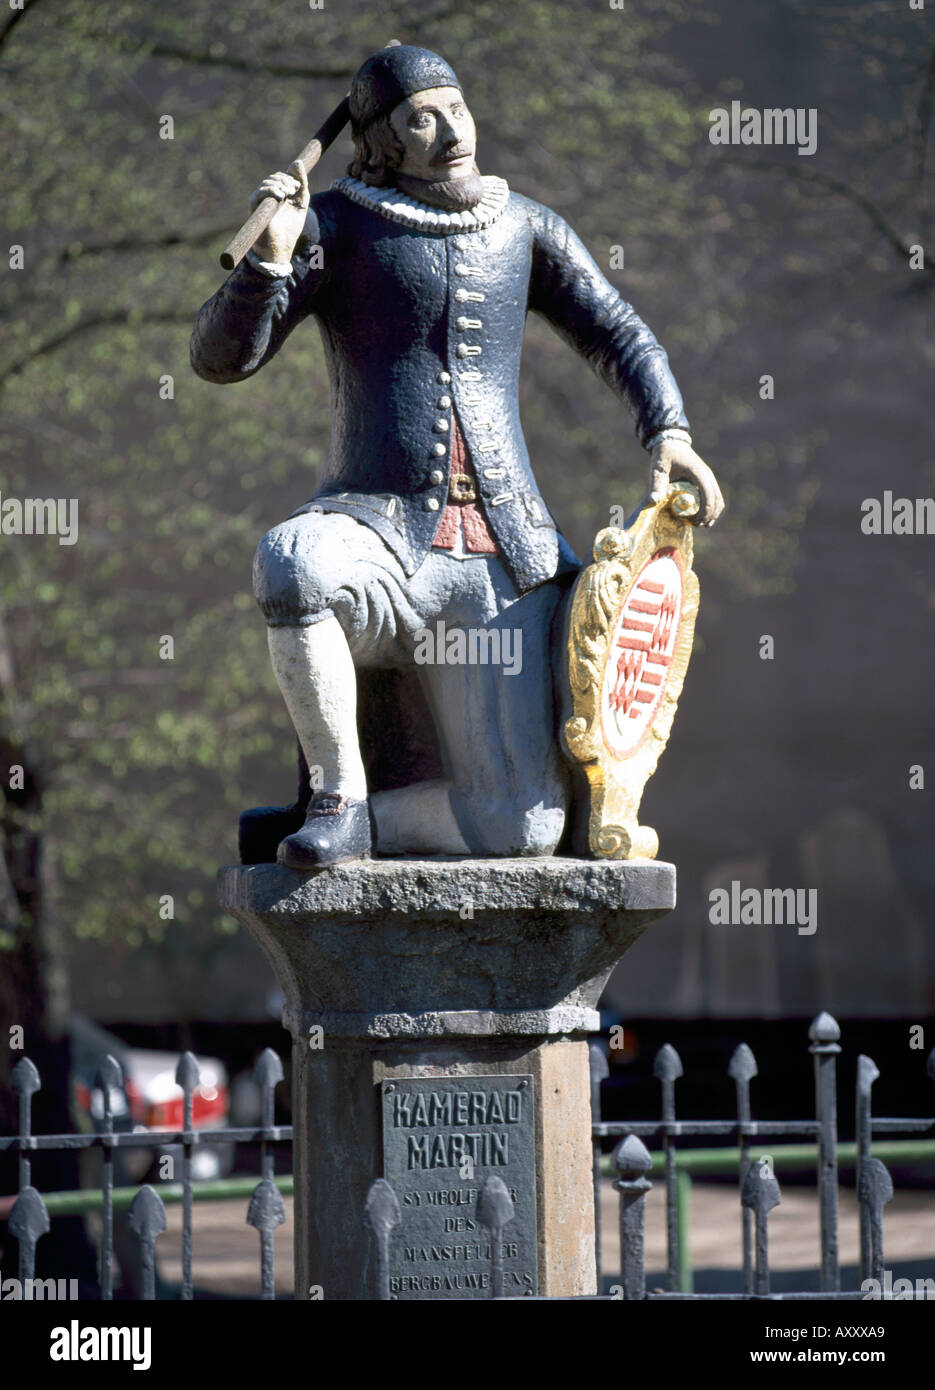 Eisleben, Lutherstadt, ' Kamerad Martin', Symbolfigur des Mansfelder Bergbaus - Stock Image